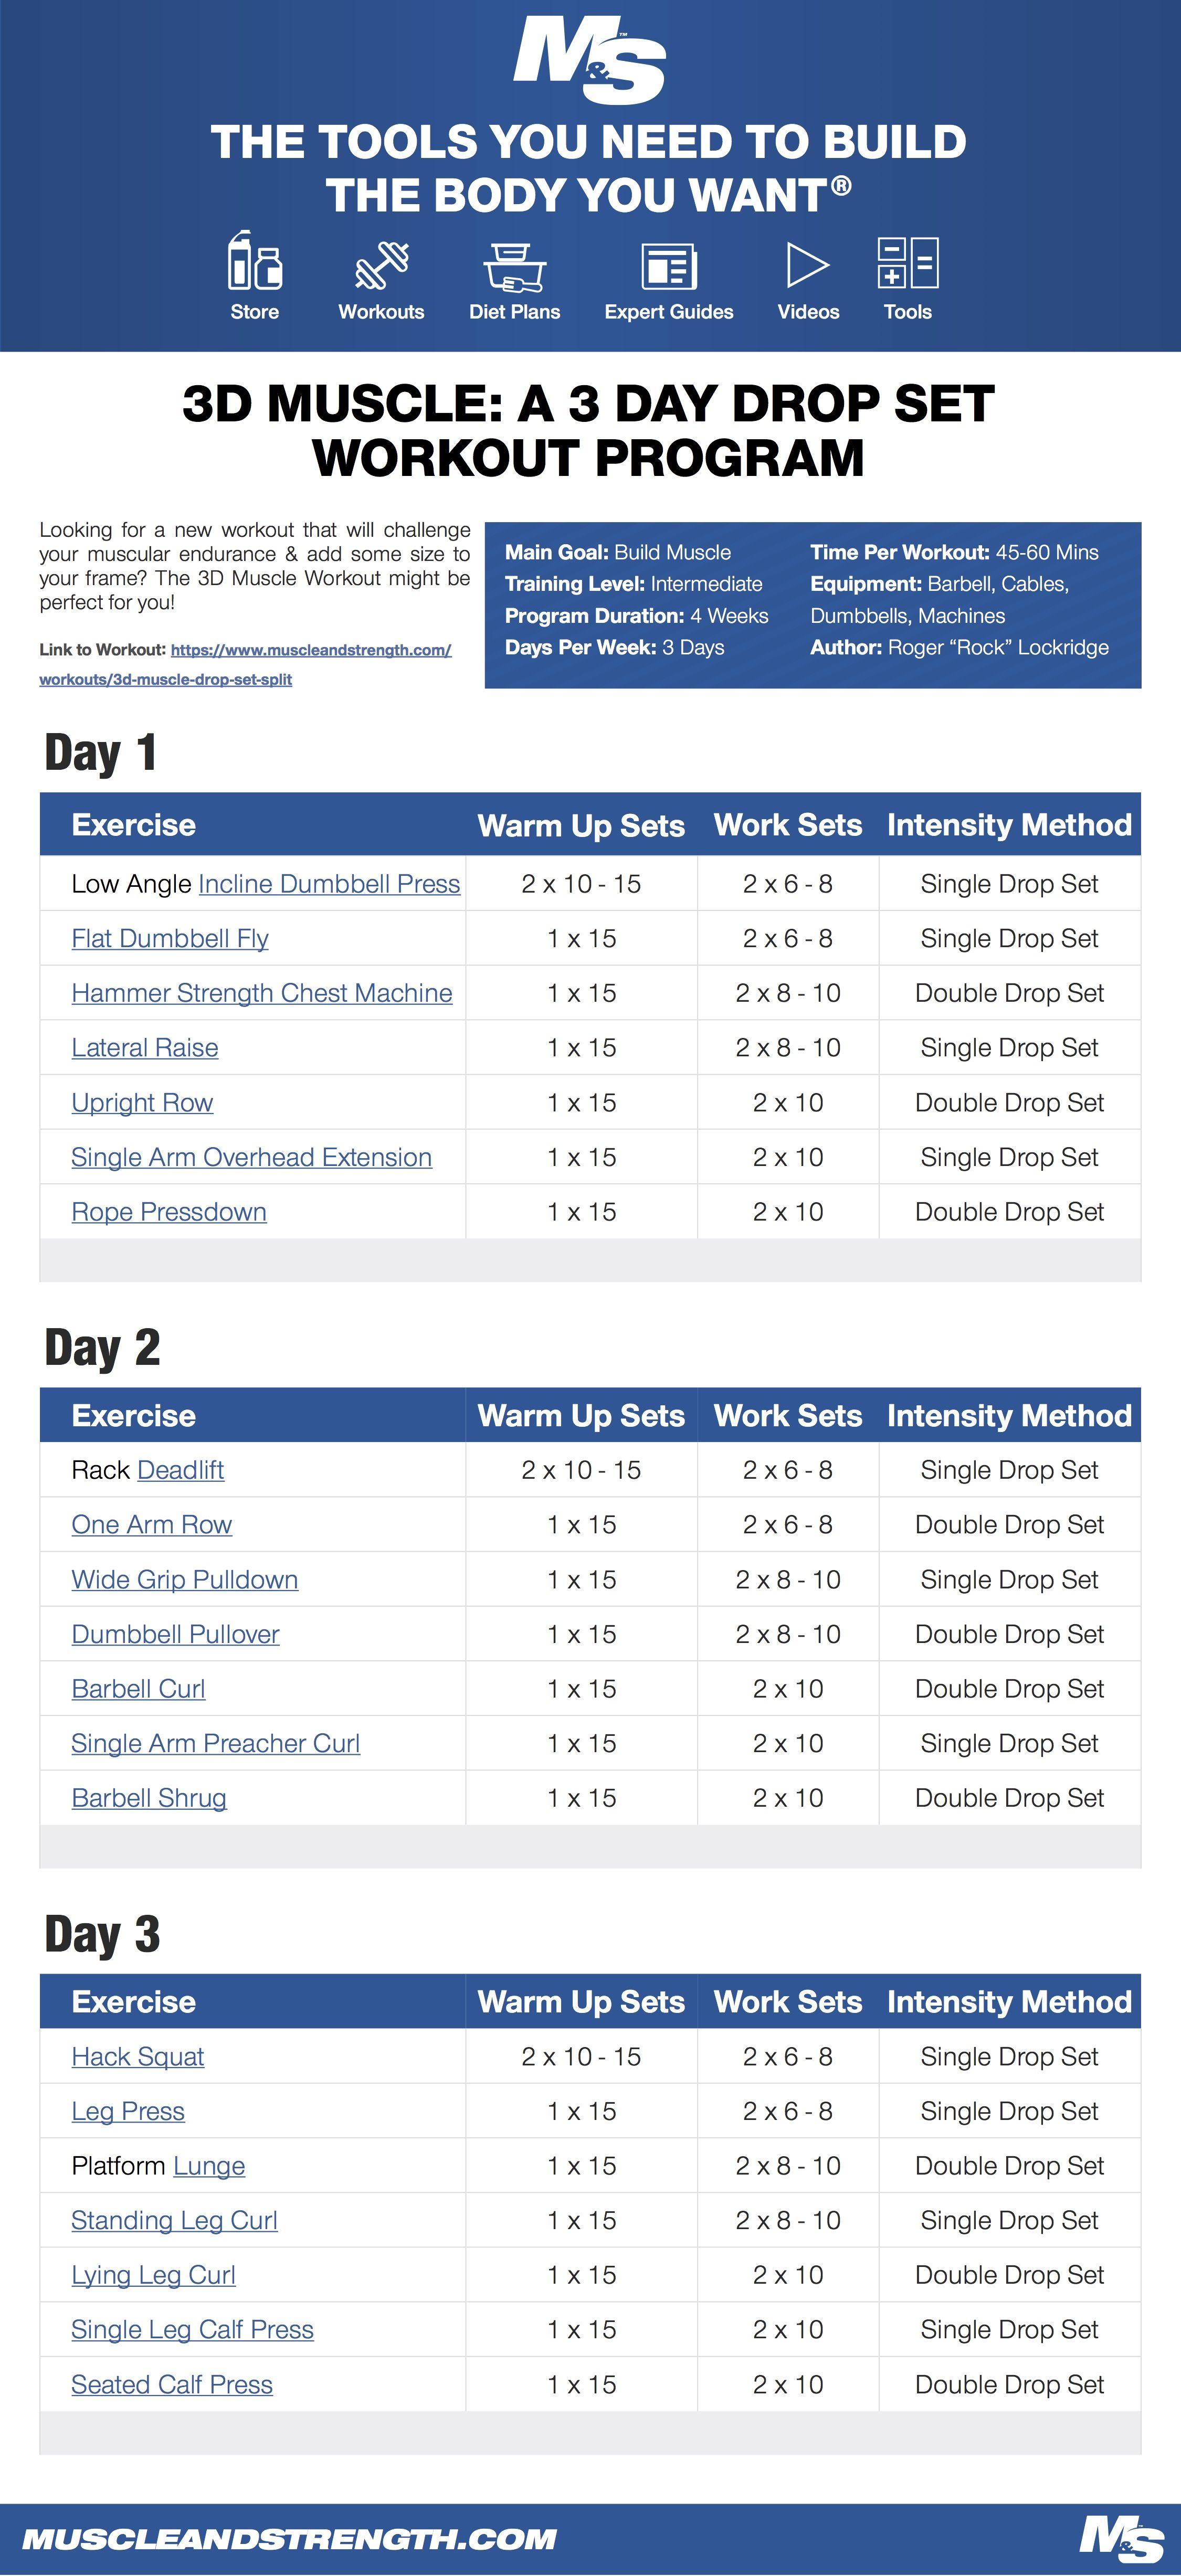 3d Muscle A 3 Day Drop Set Workout Program Drop Sets Workout